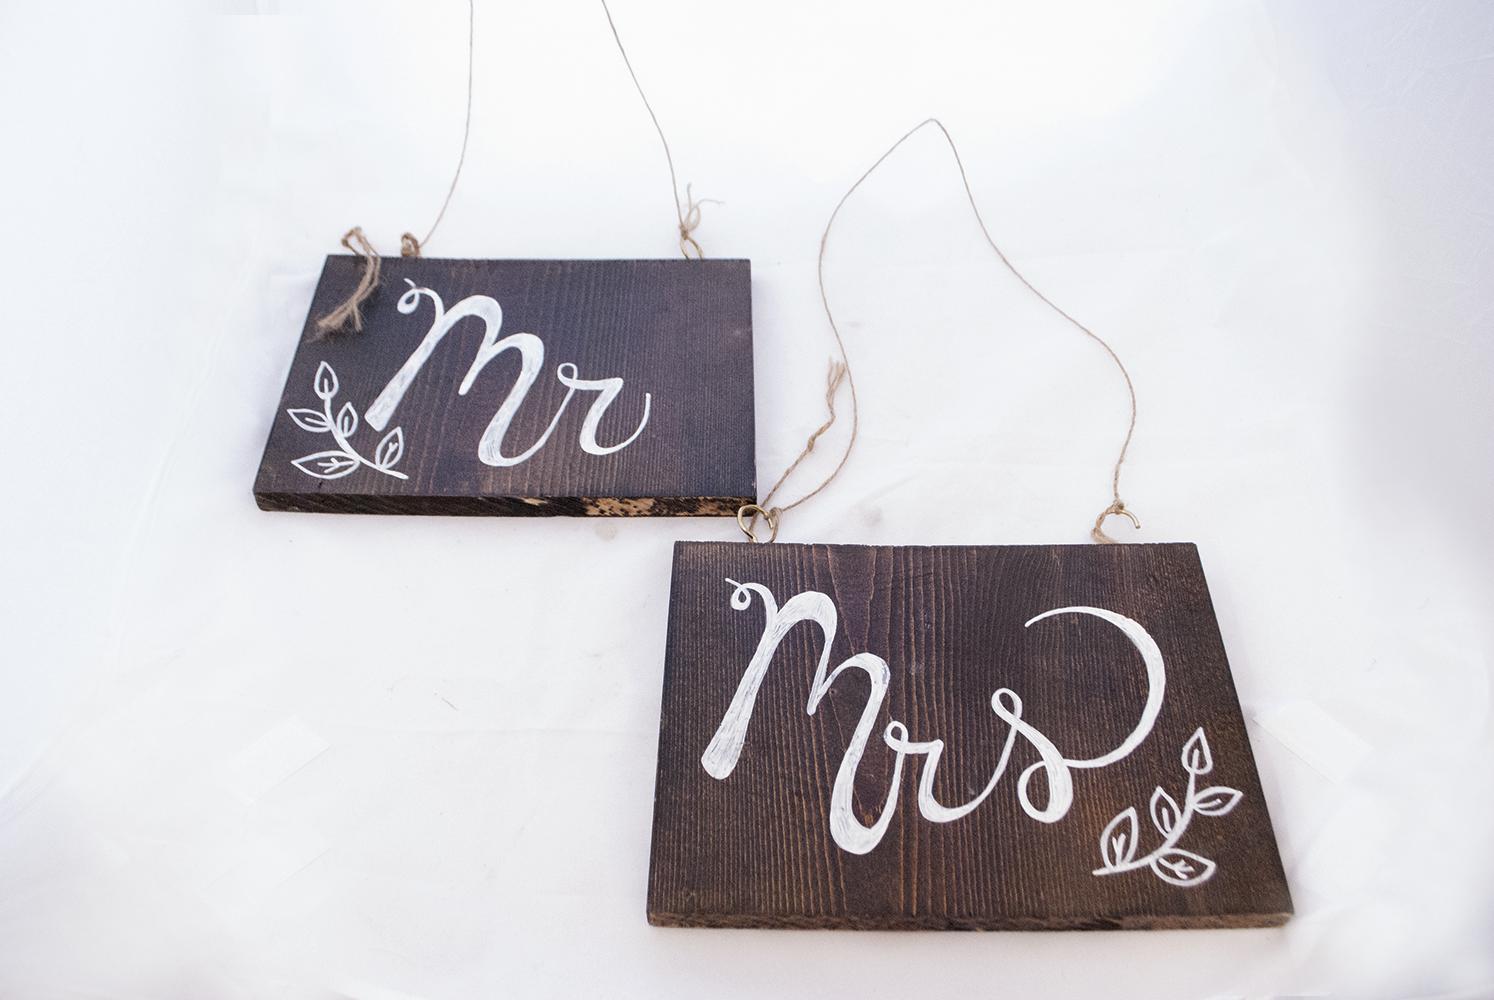 Mr. & Mrs. wood blocks  Quantity: 1  Price: $30.00